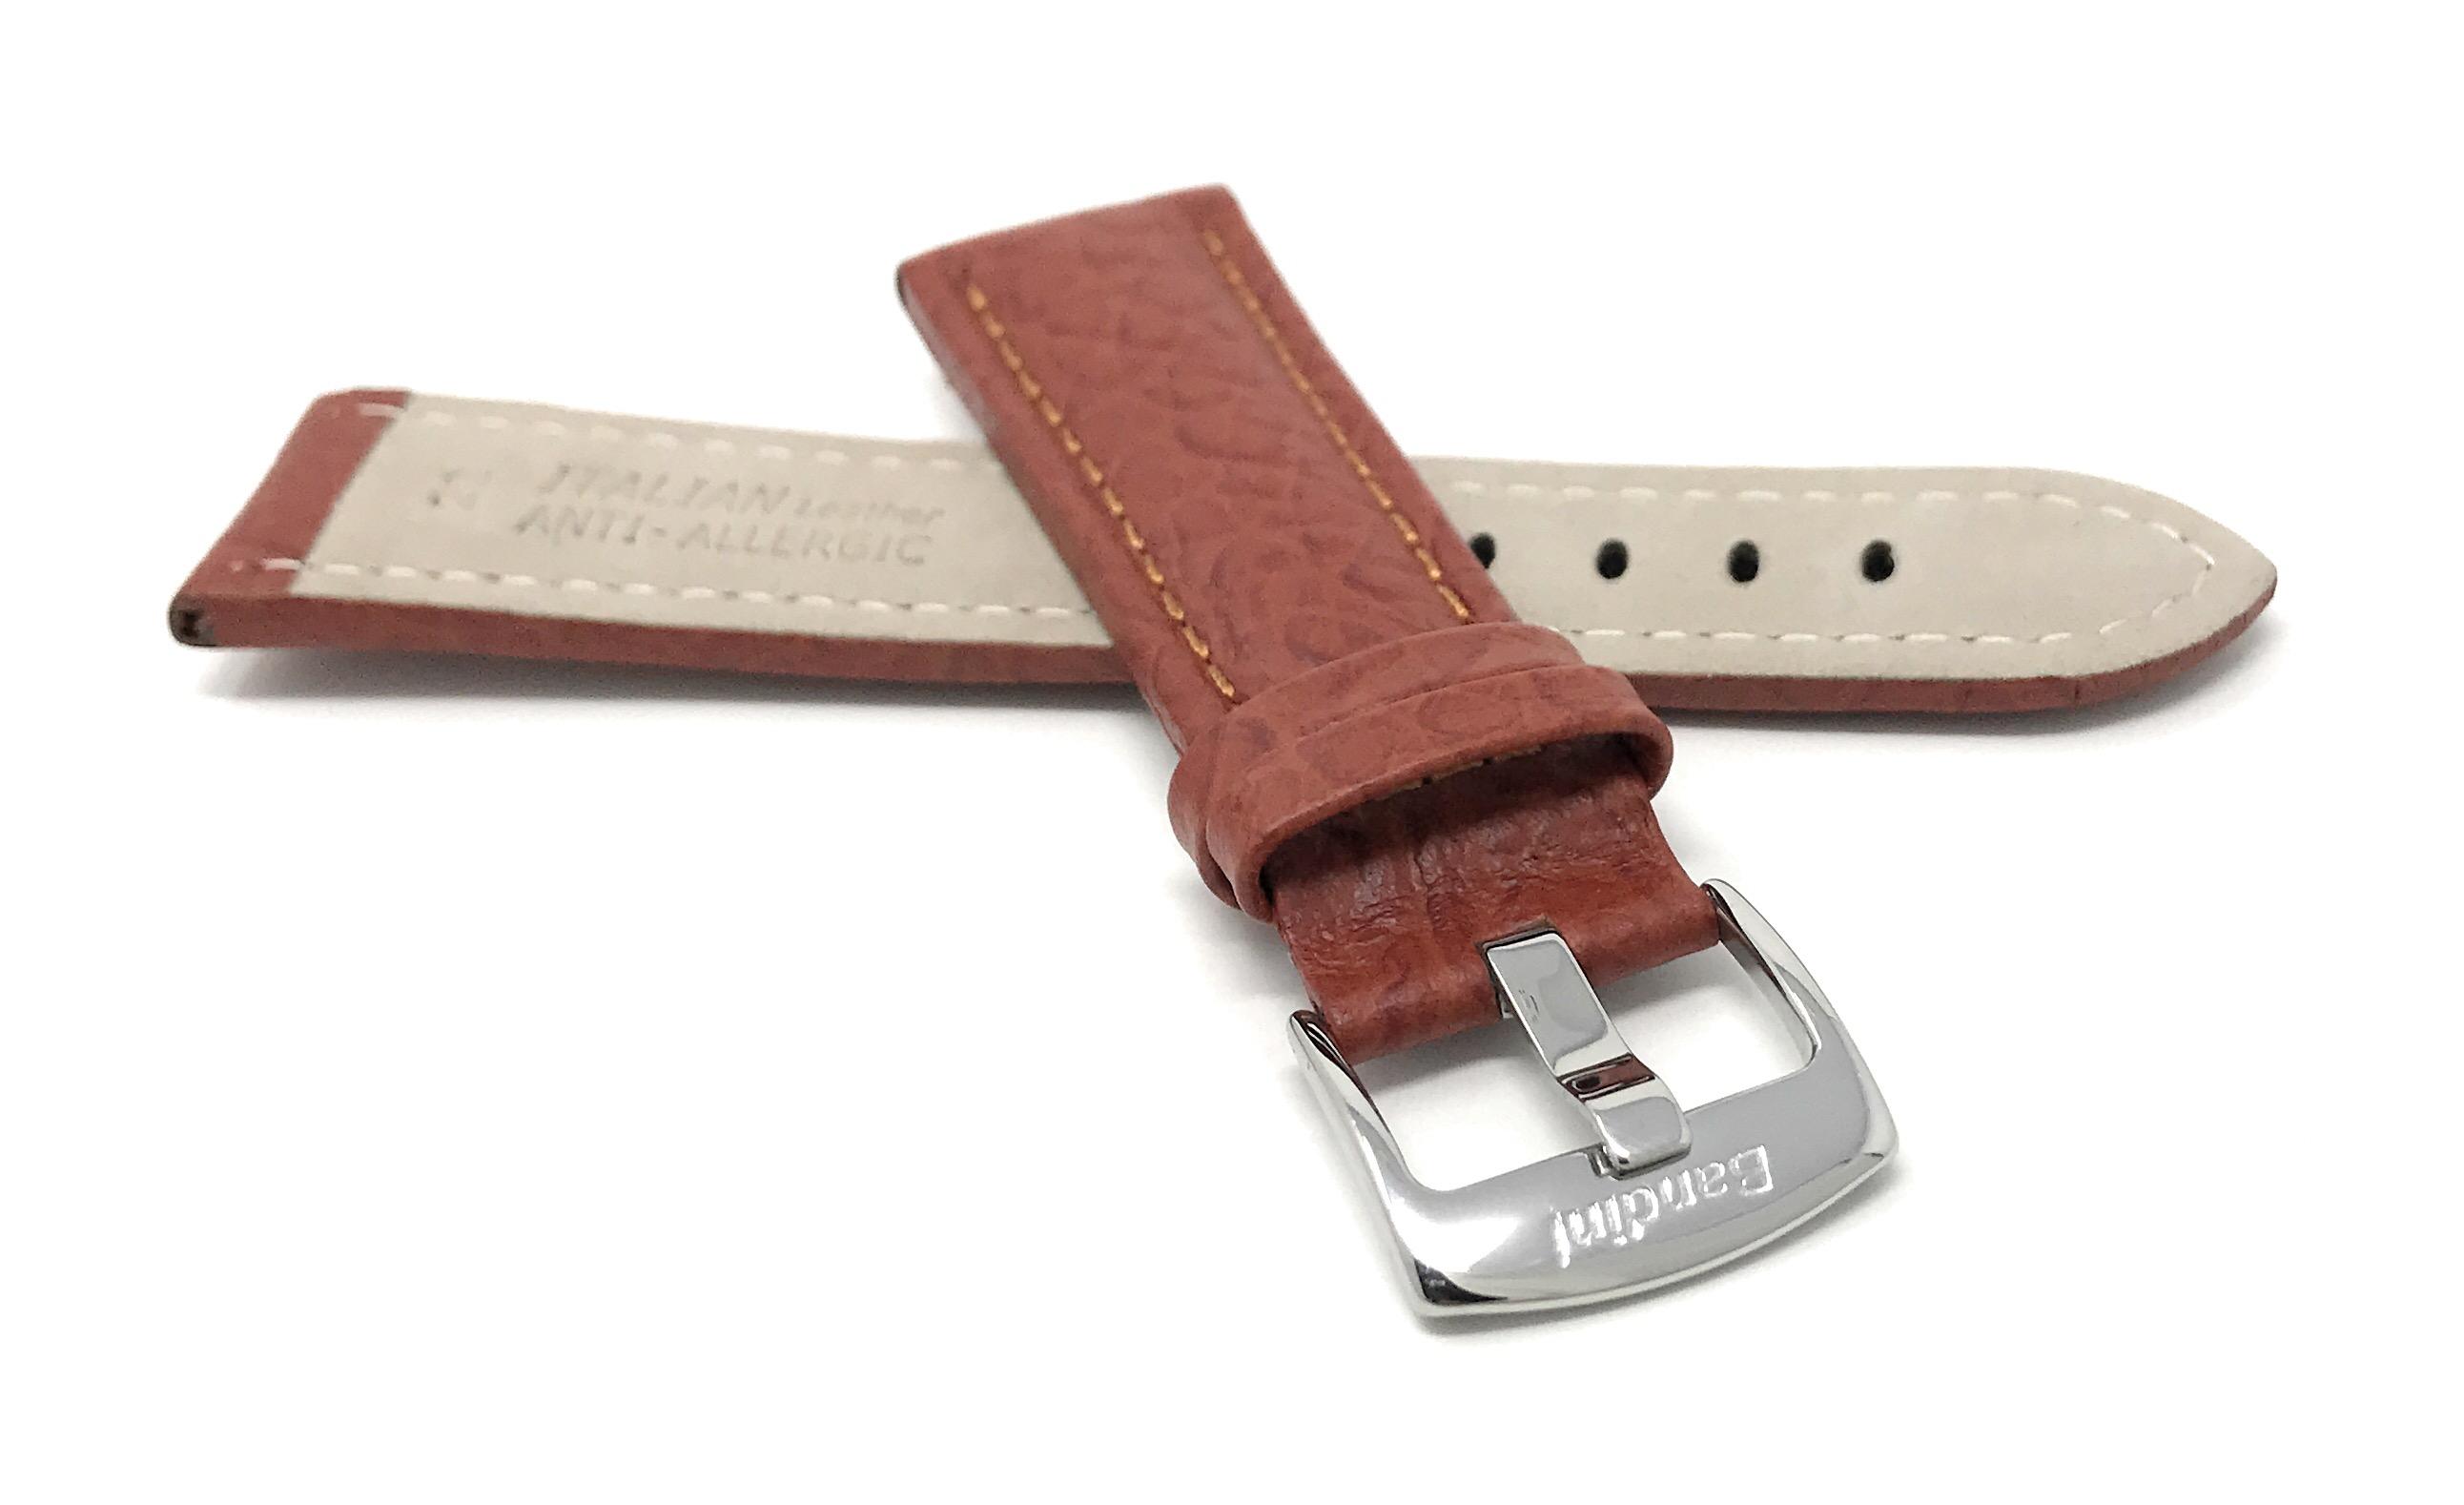 Bandini-Watch-Band-Leather-Strap-Buffalo-Pattern-18mm-30mm-Extra-Long-Also thumbnail 16